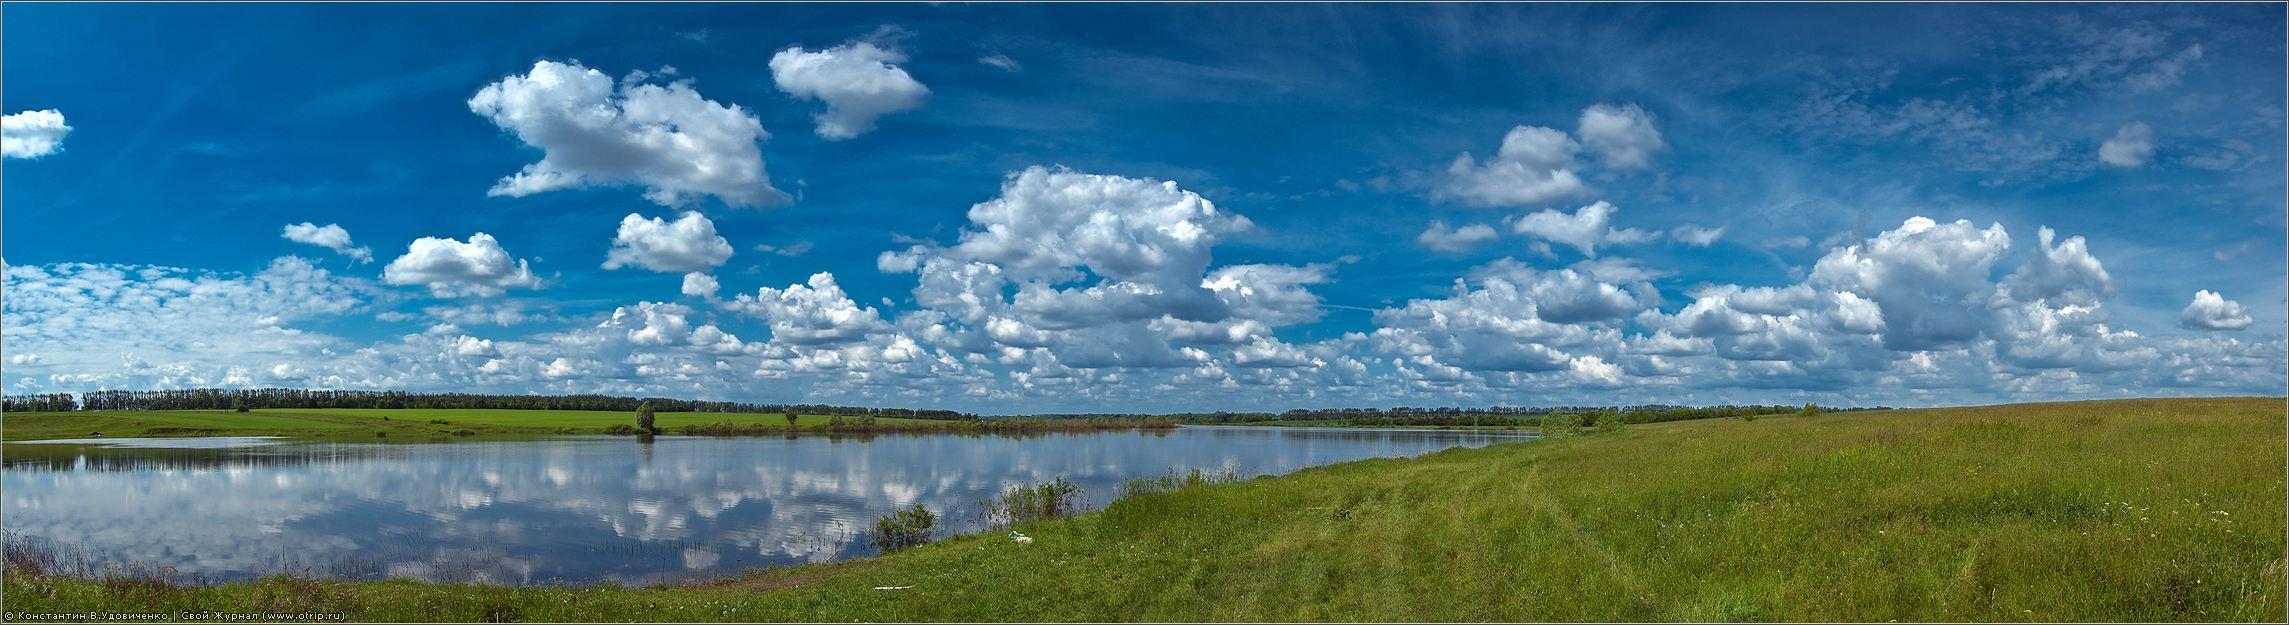 0942-8166x3161s_2.jpg - Липецкая и Тульская области (30.05.2010)